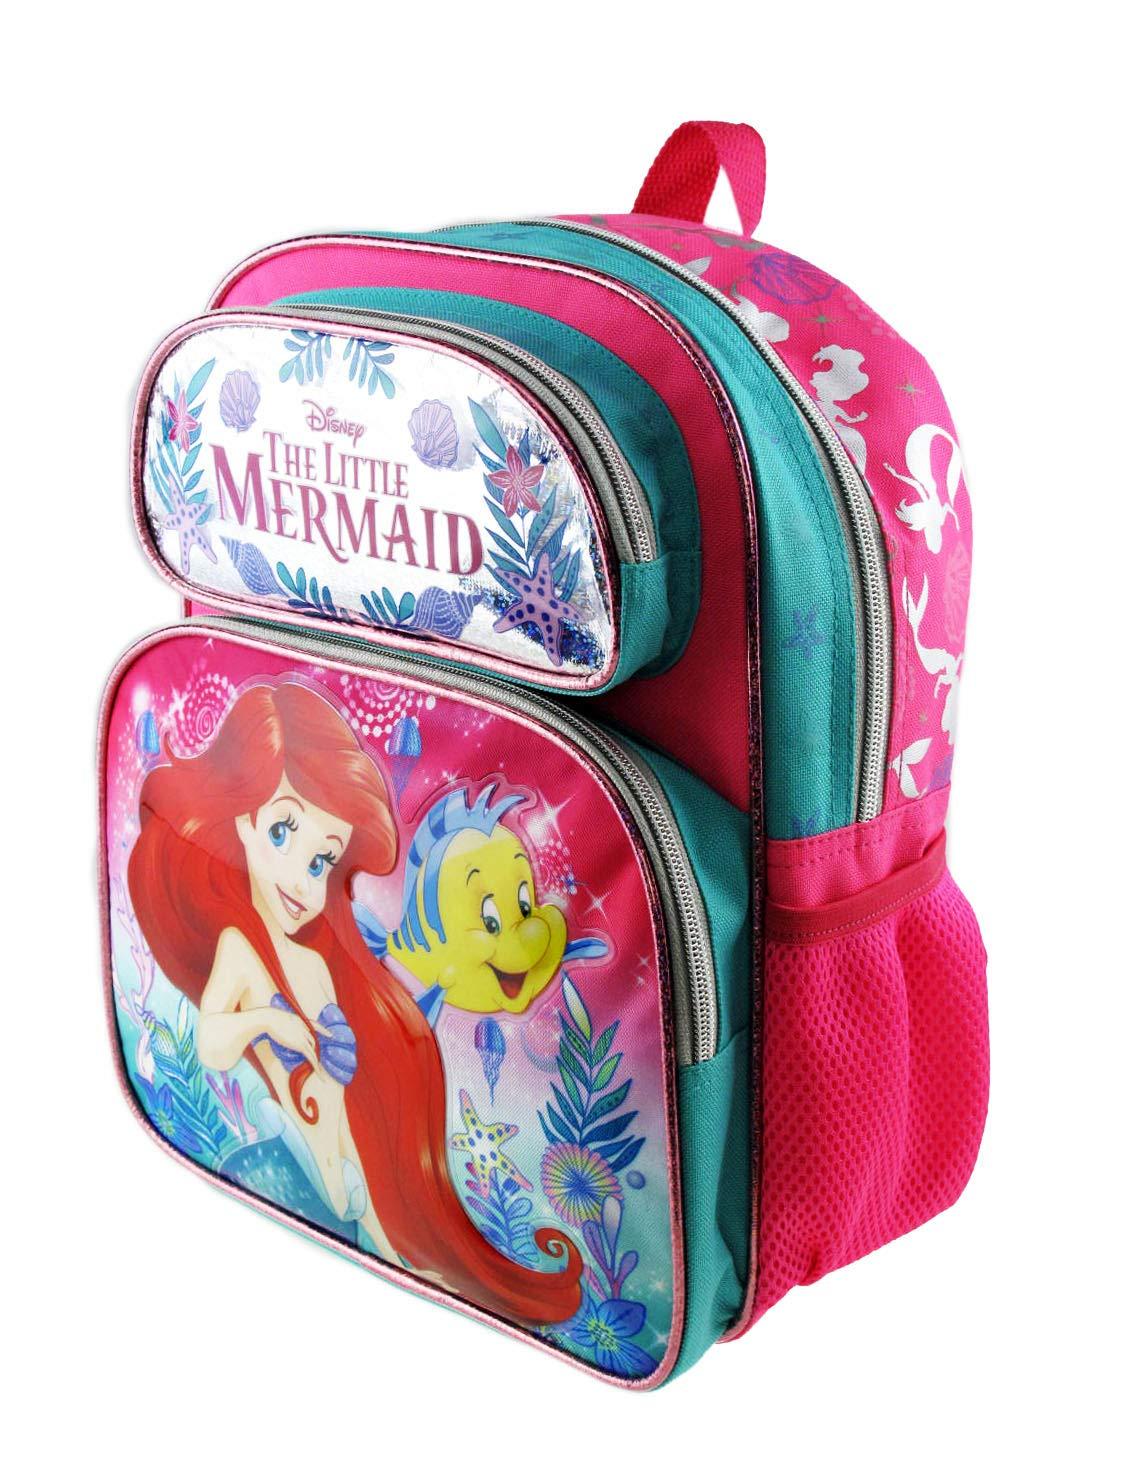 Disney Seashore 12 New 009045 The Little Mermaid Small Backpack